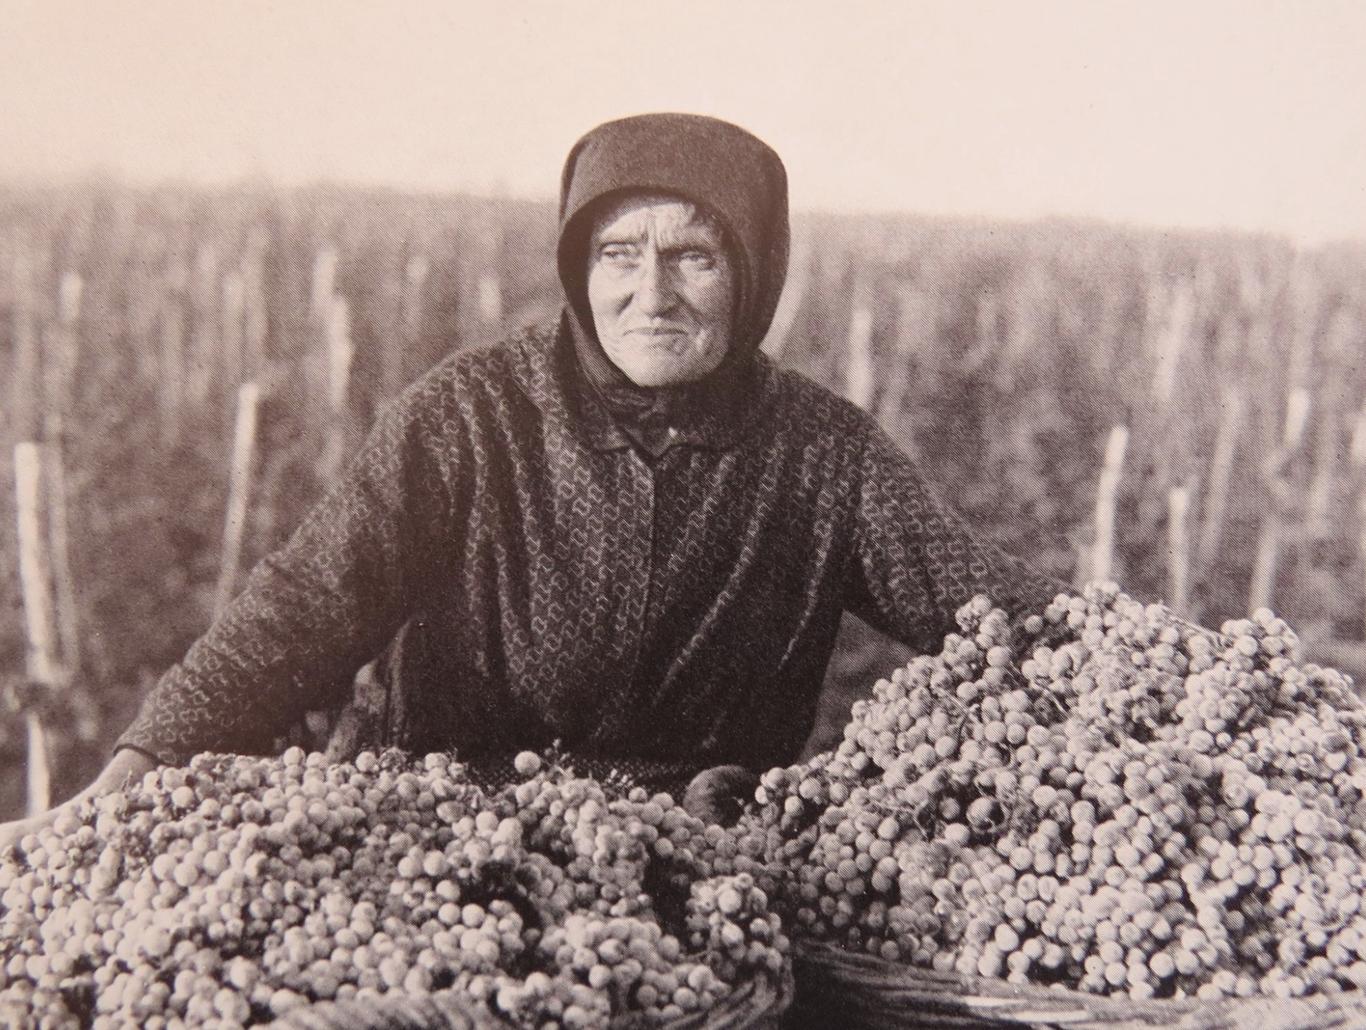 Village woman gathering the harvest.